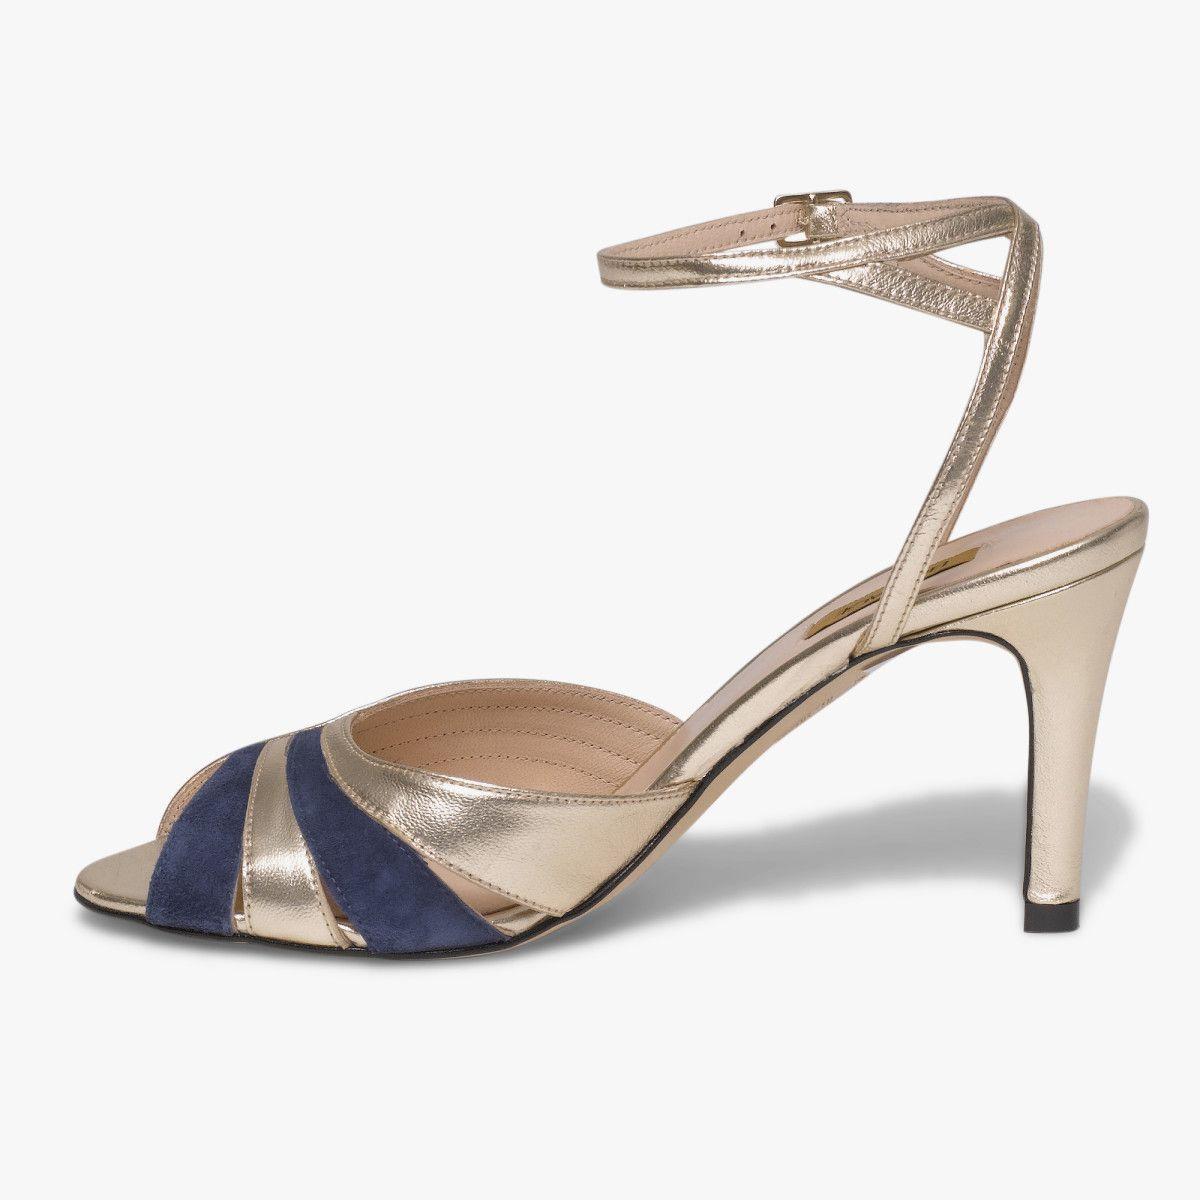 2ac3aea691b181 BOCAGE - Chaussures Femme en SOLDES | Bocage | shoes!